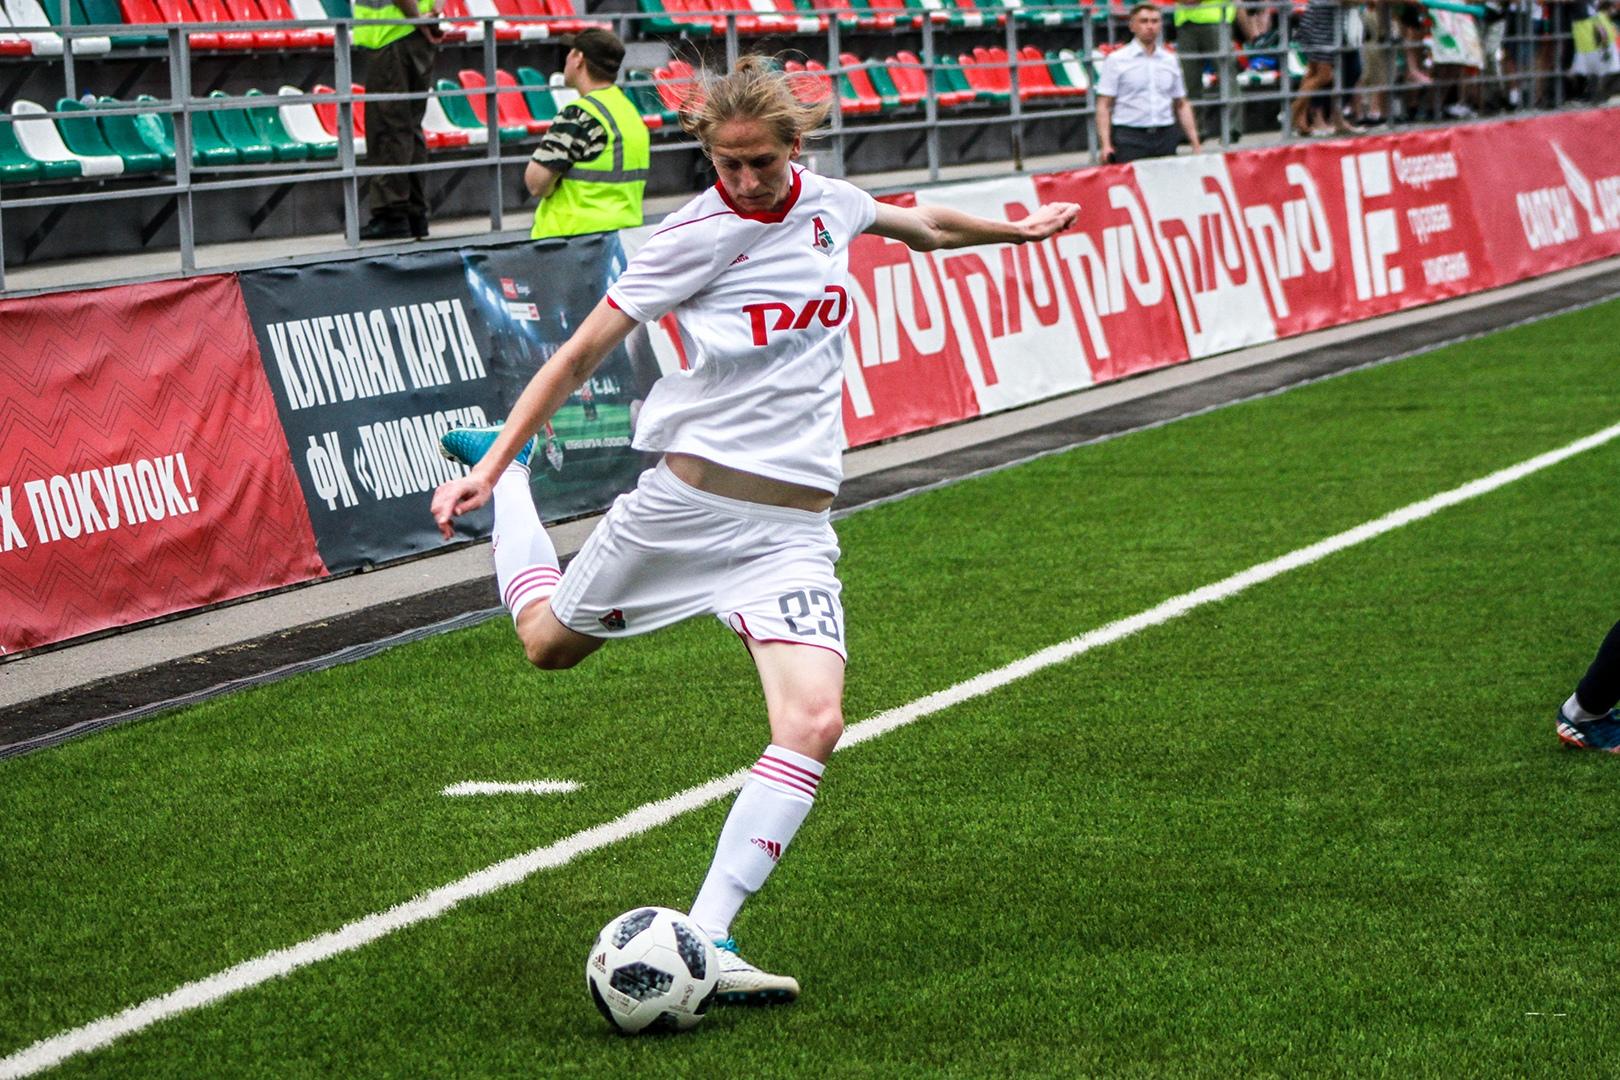 ЖФК Локомотив. Фото: Дмитрий Бурдонов / Loko.News